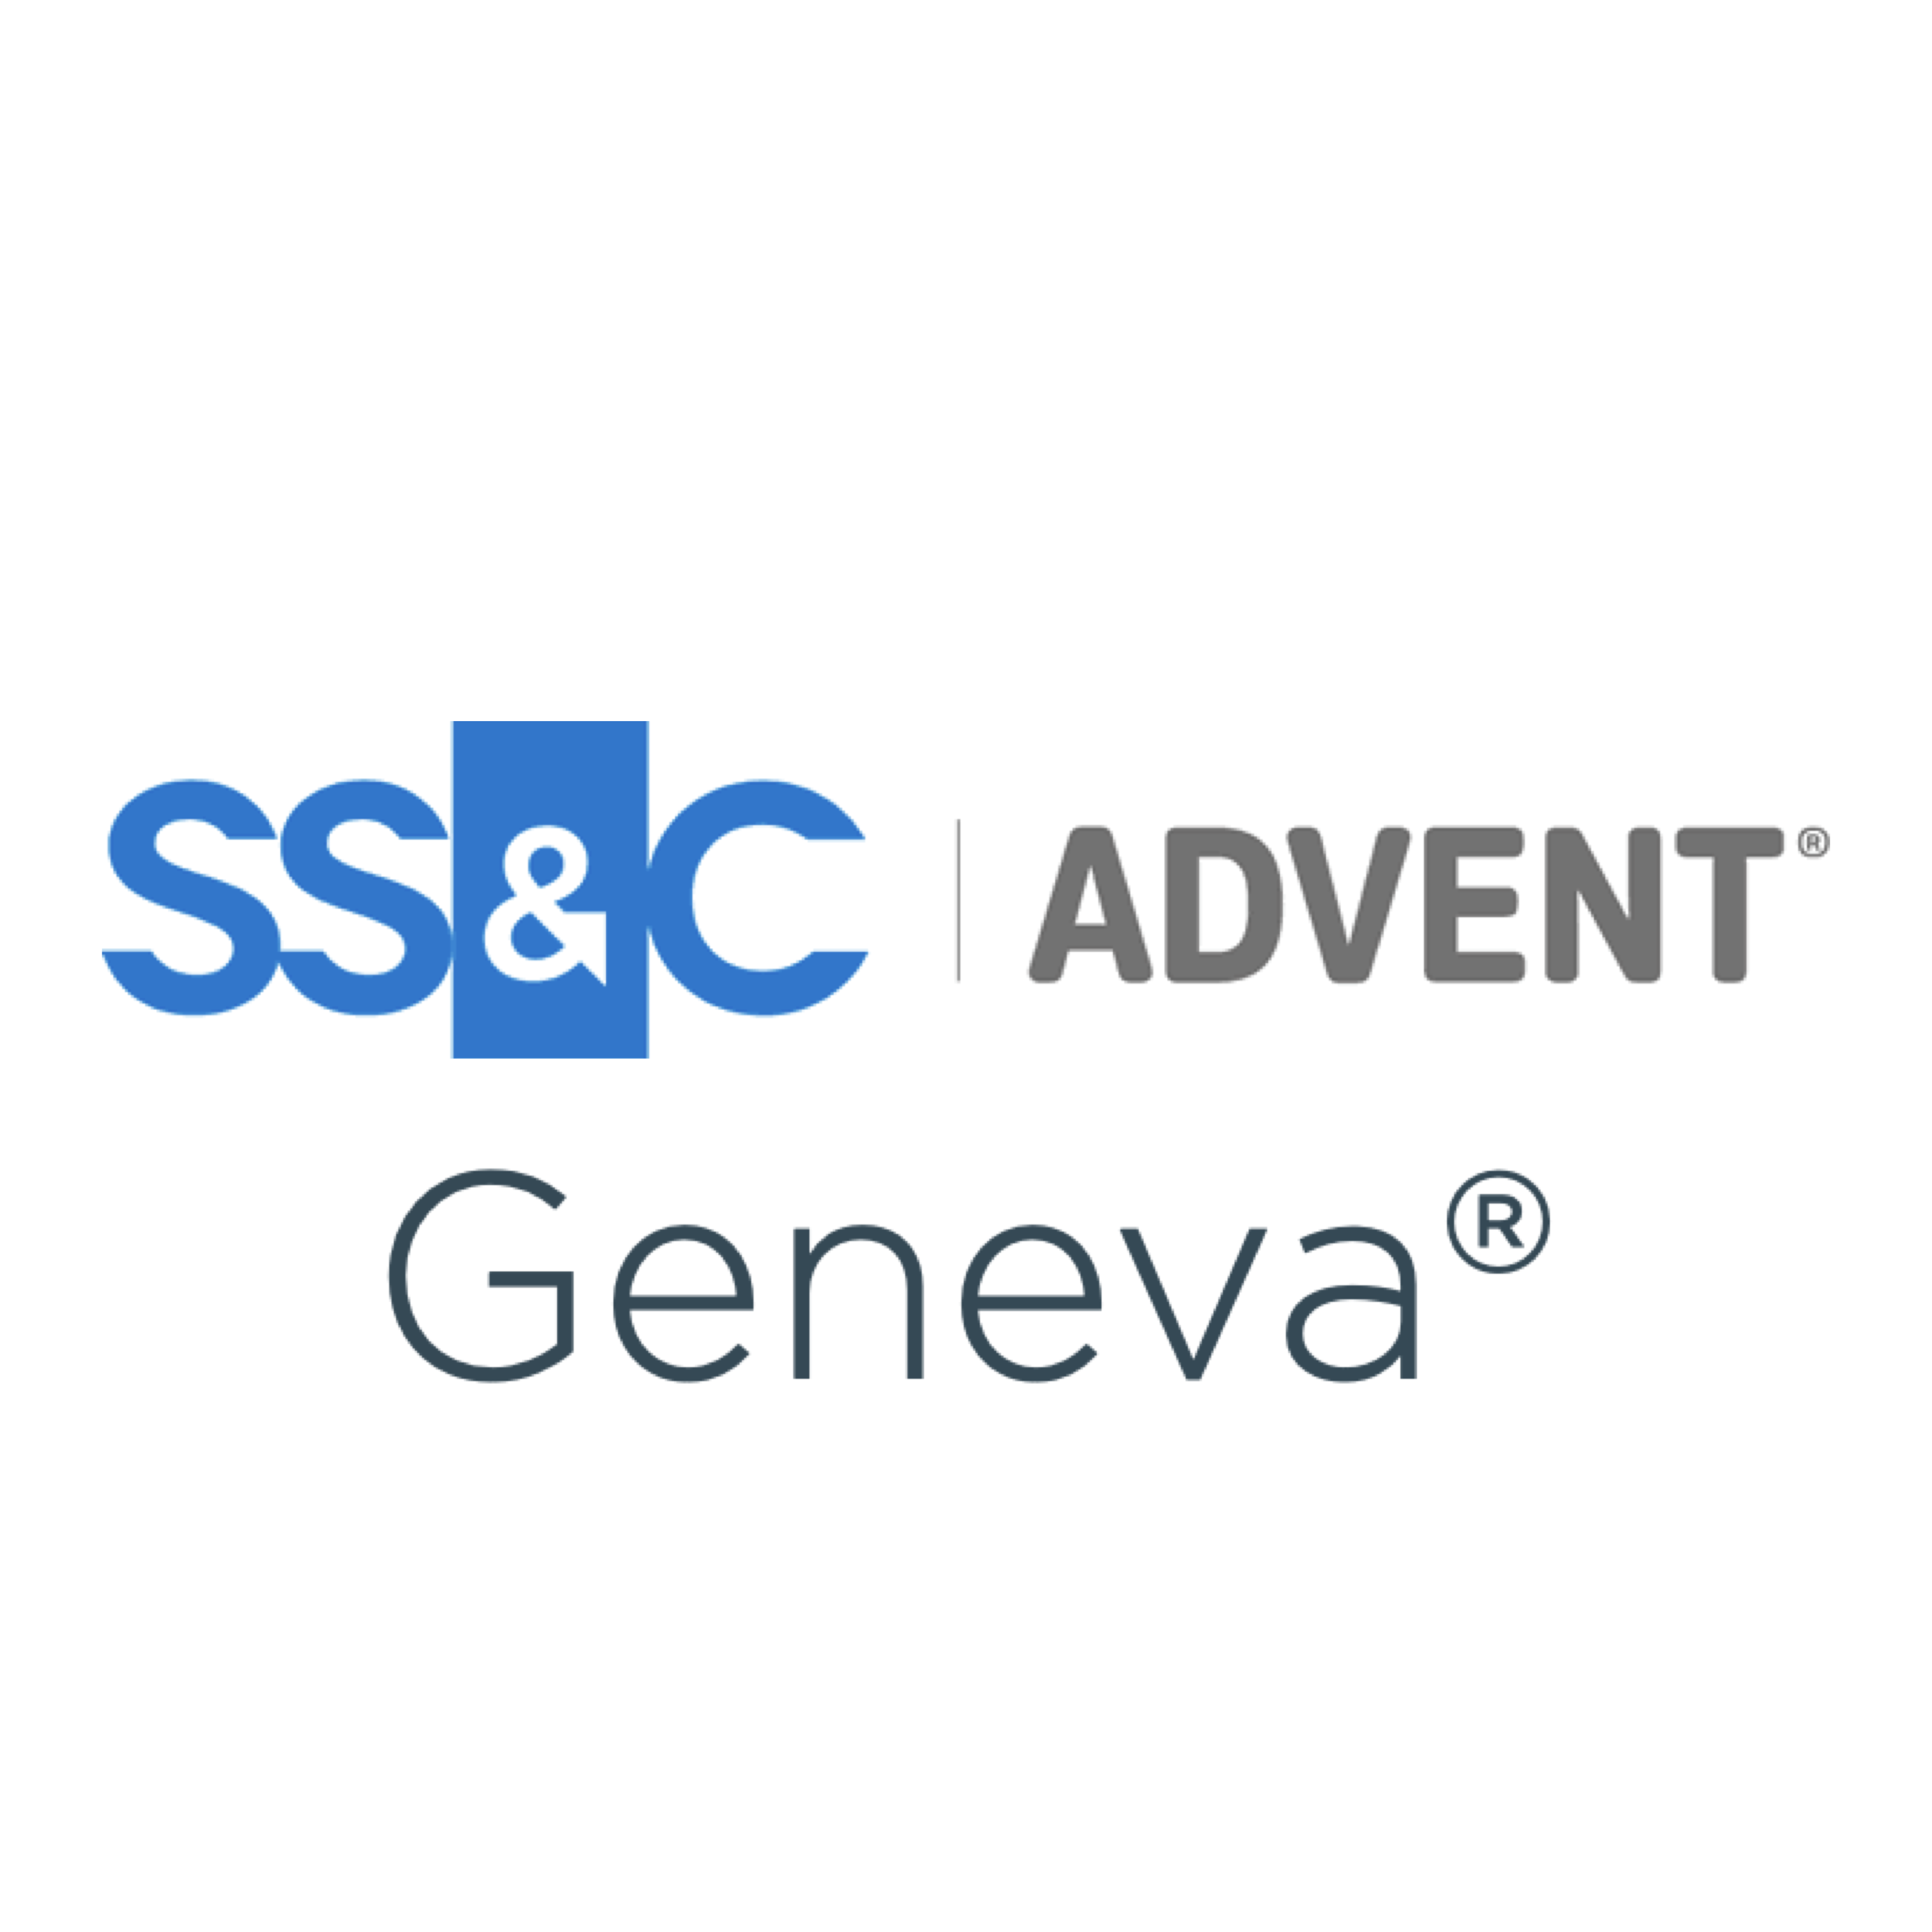 SS&C Advent Geneva